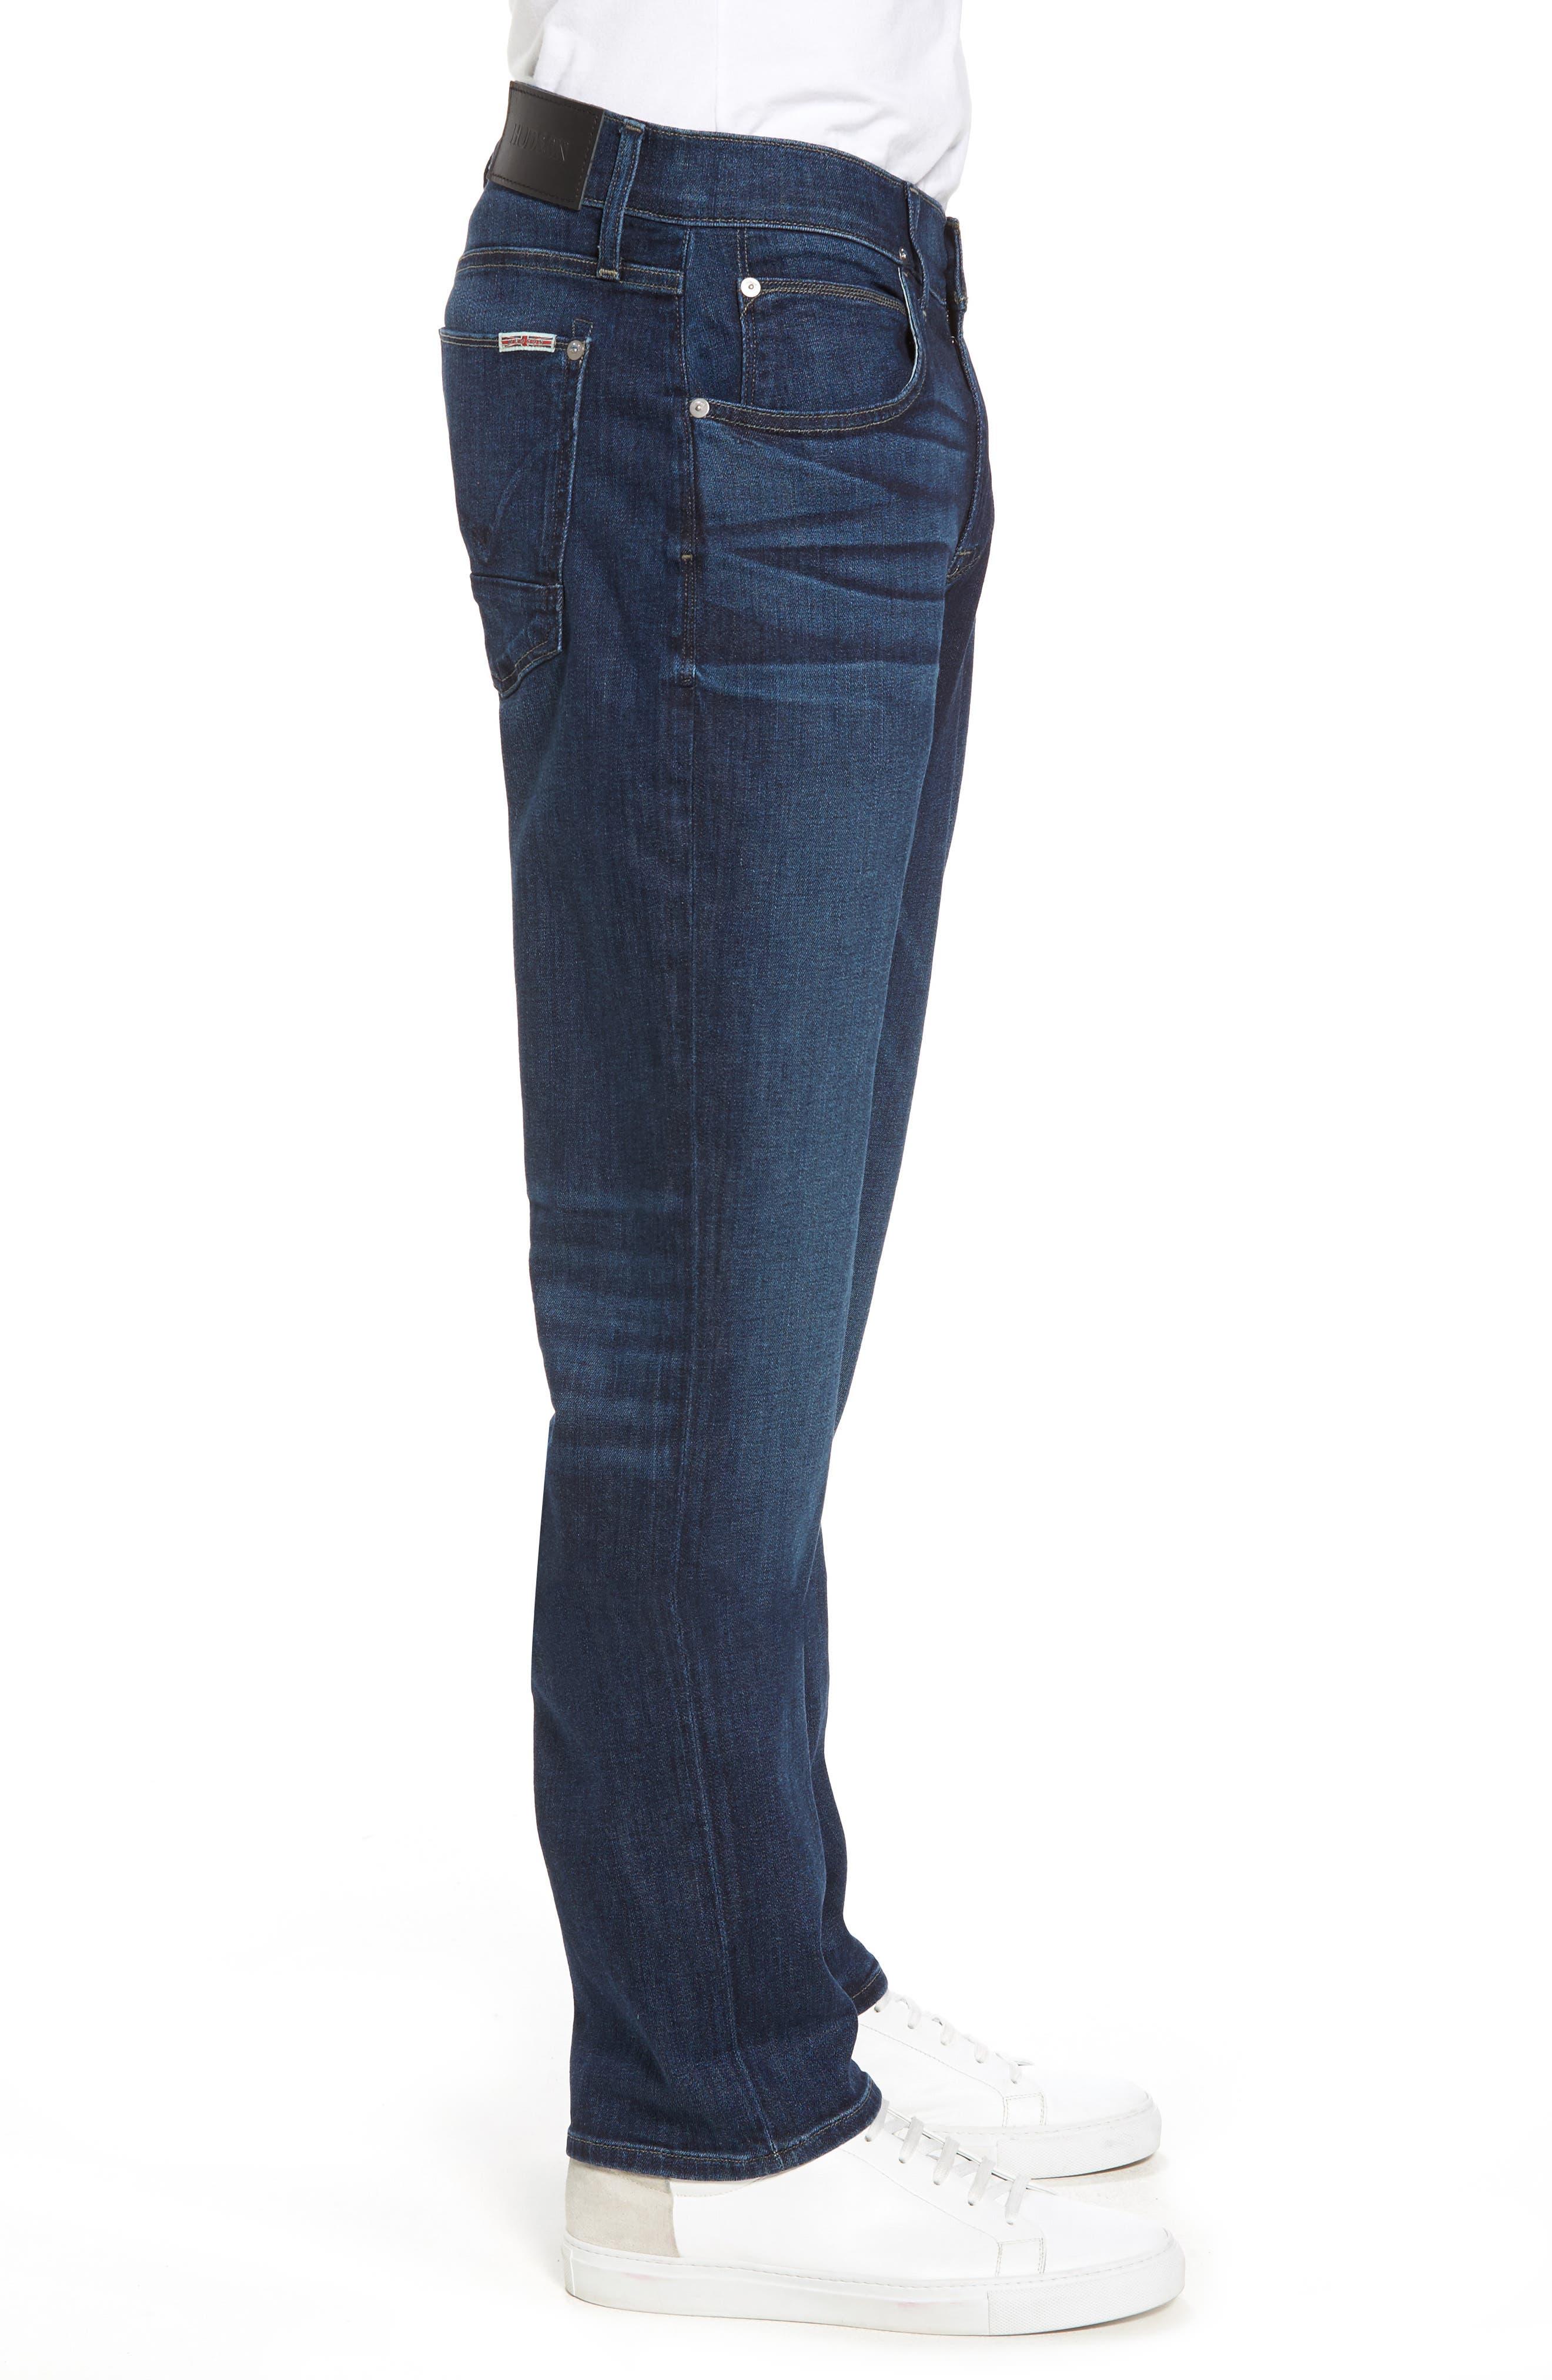 Byron Slim Straight Fit Jeans,                             Alternate thumbnail 3, color,                             Draper